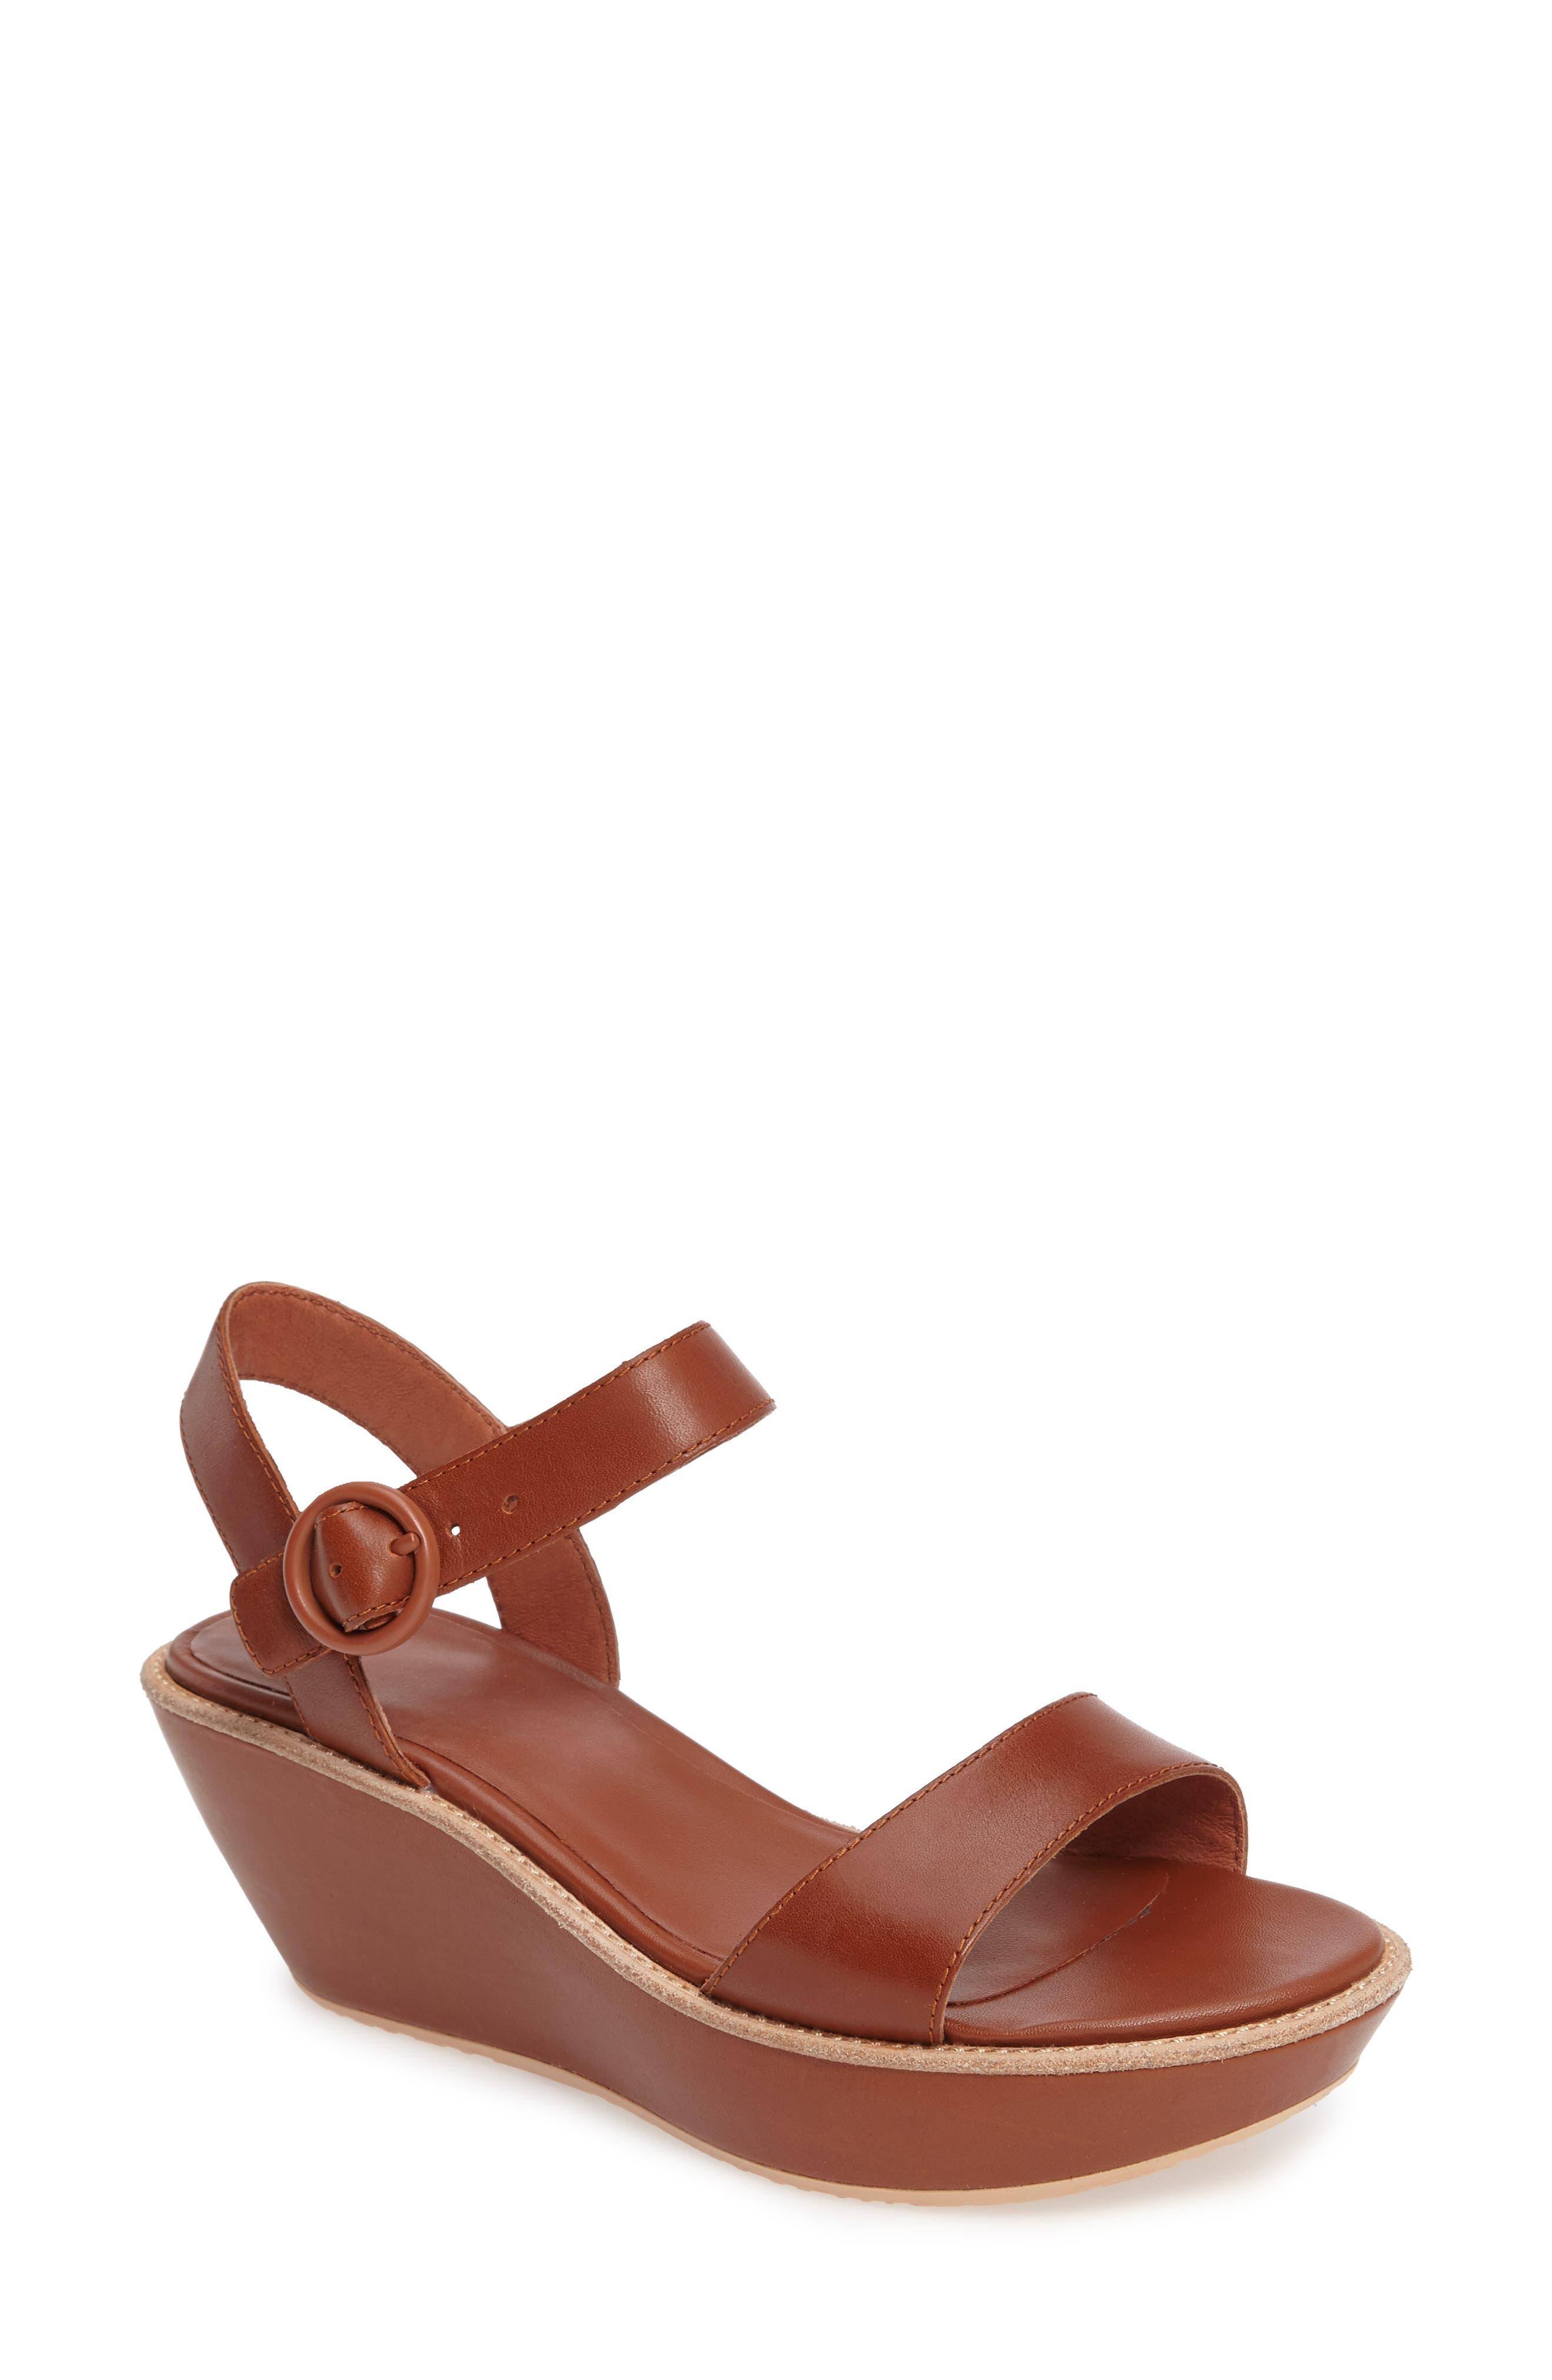 'Damas' Wedge Sandal,                             Main thumbnail 1, color,                             Brown Leather